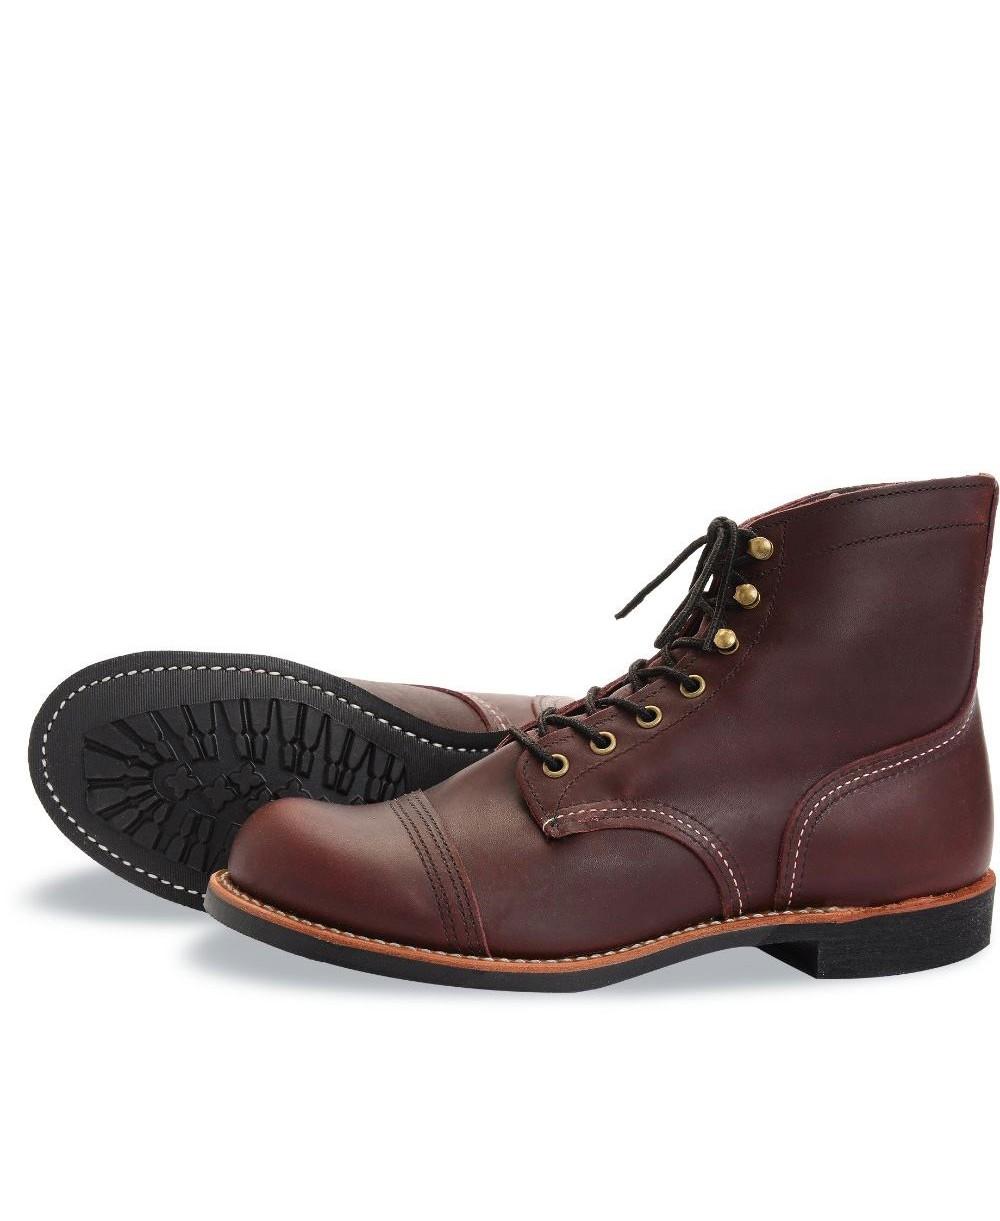 Men's Iron Ranger Leather Boots 8119